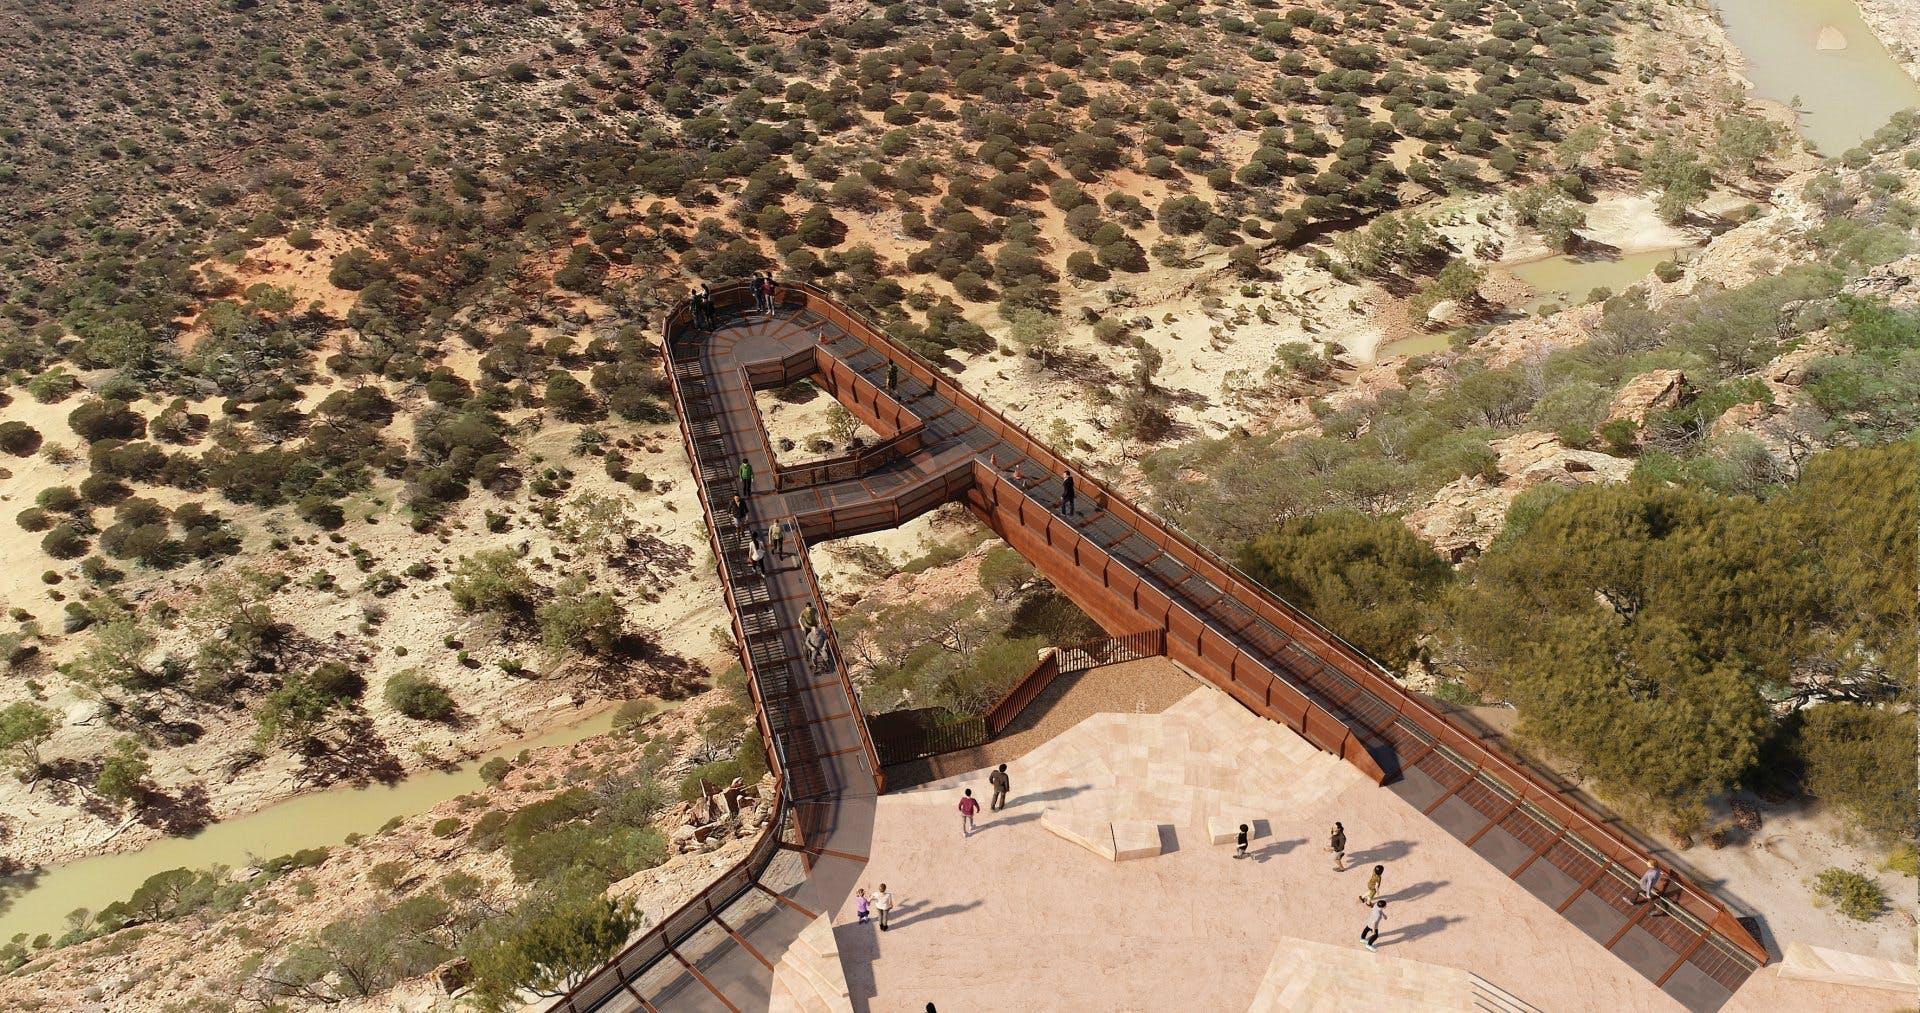 Kalbarri Skywalk - image credit BOCOL Constructions, Dermot Boyle